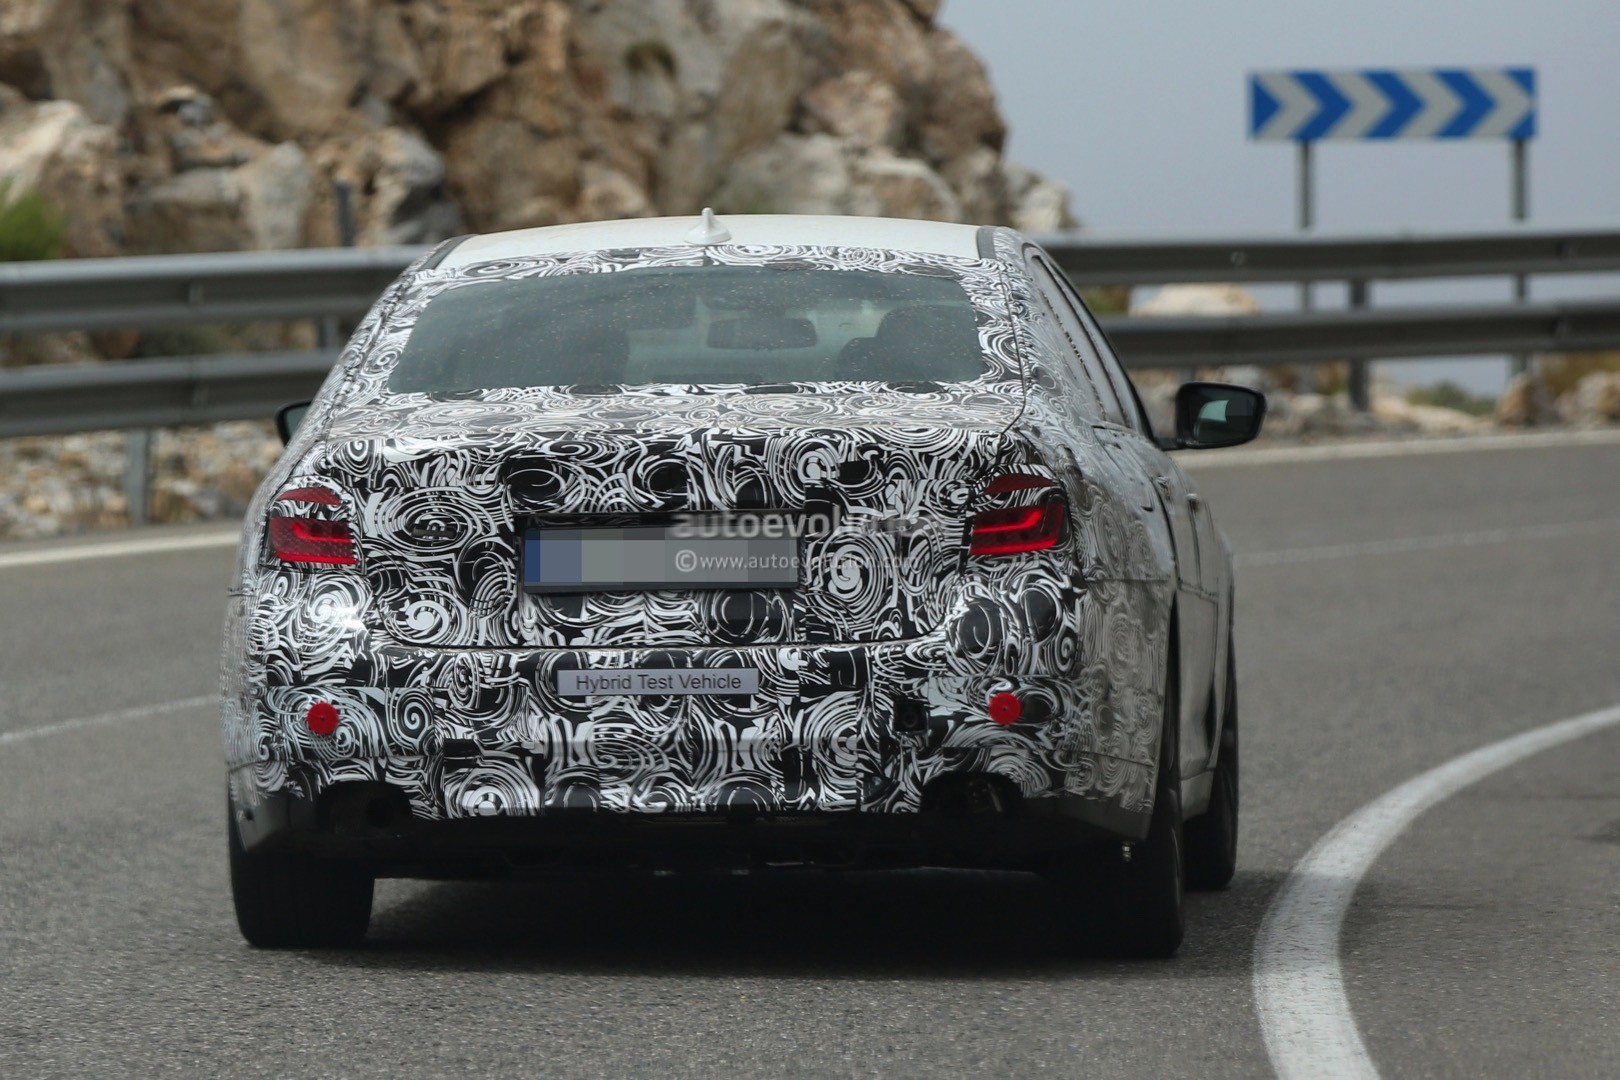 2017 BMW G30 5 Series Spied Closer, Prototype Interior Hints